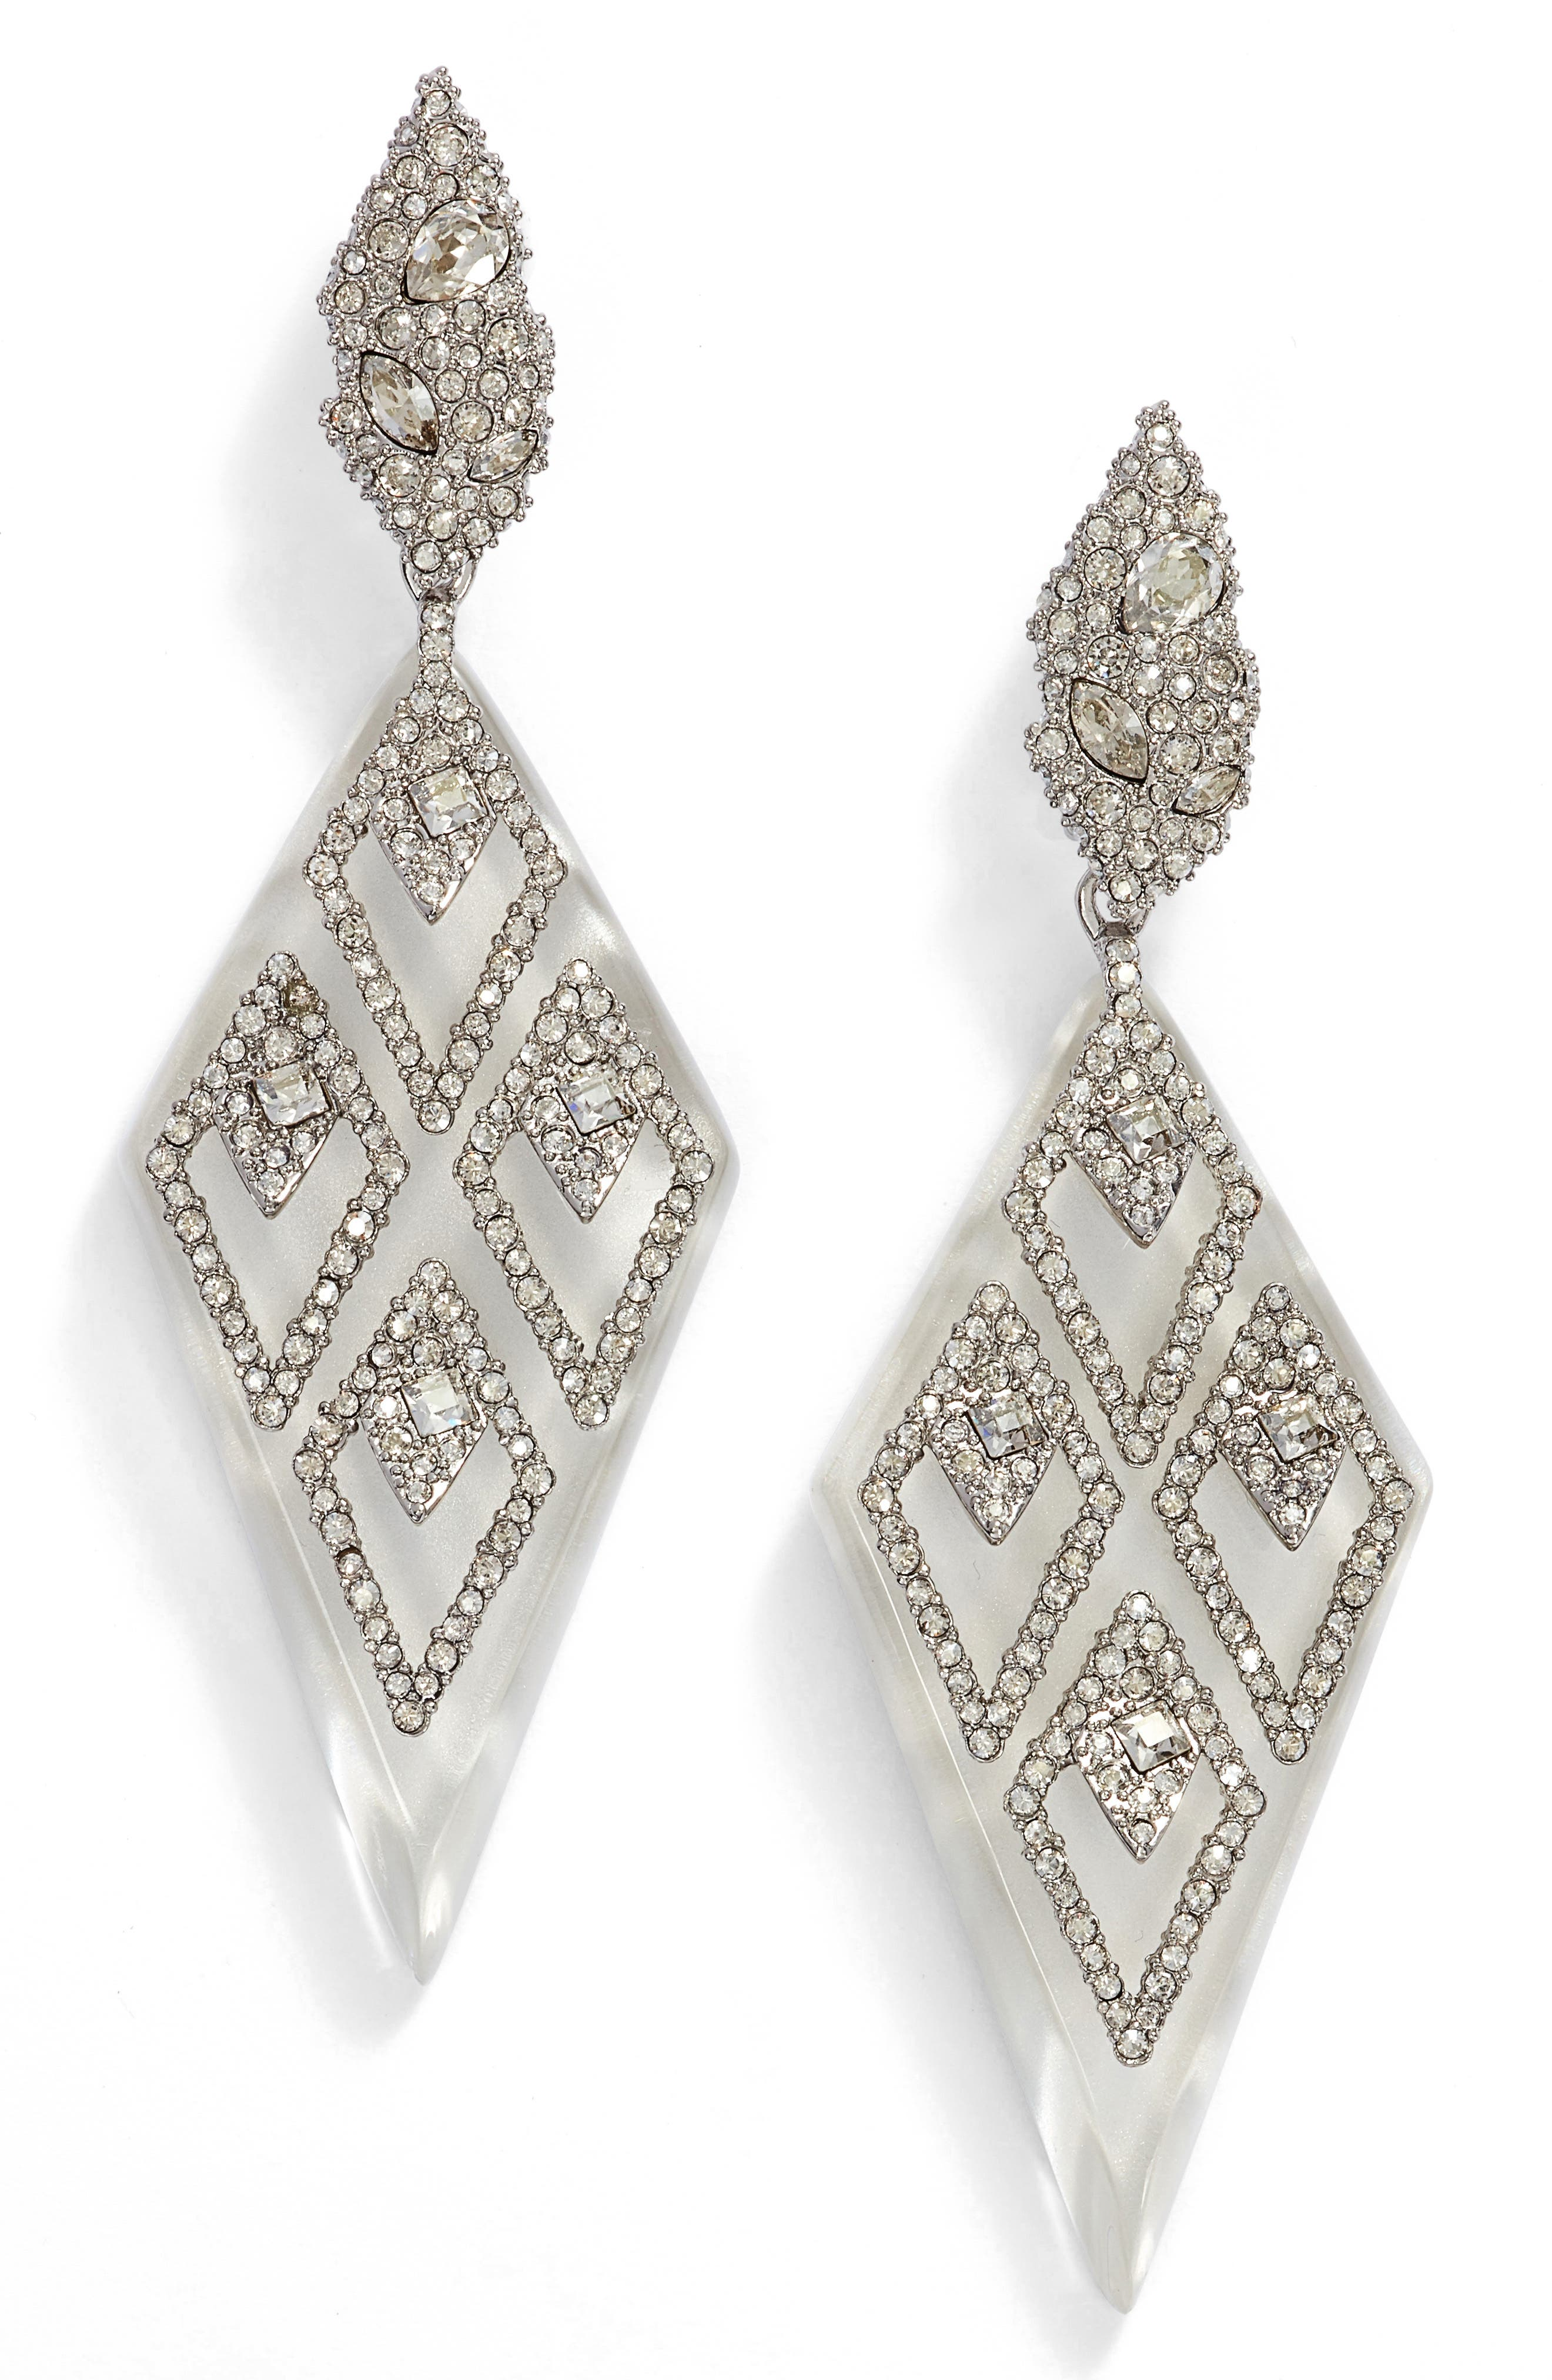 Spike Clip-On Drop Earrings,                         Main,                         color, Silver